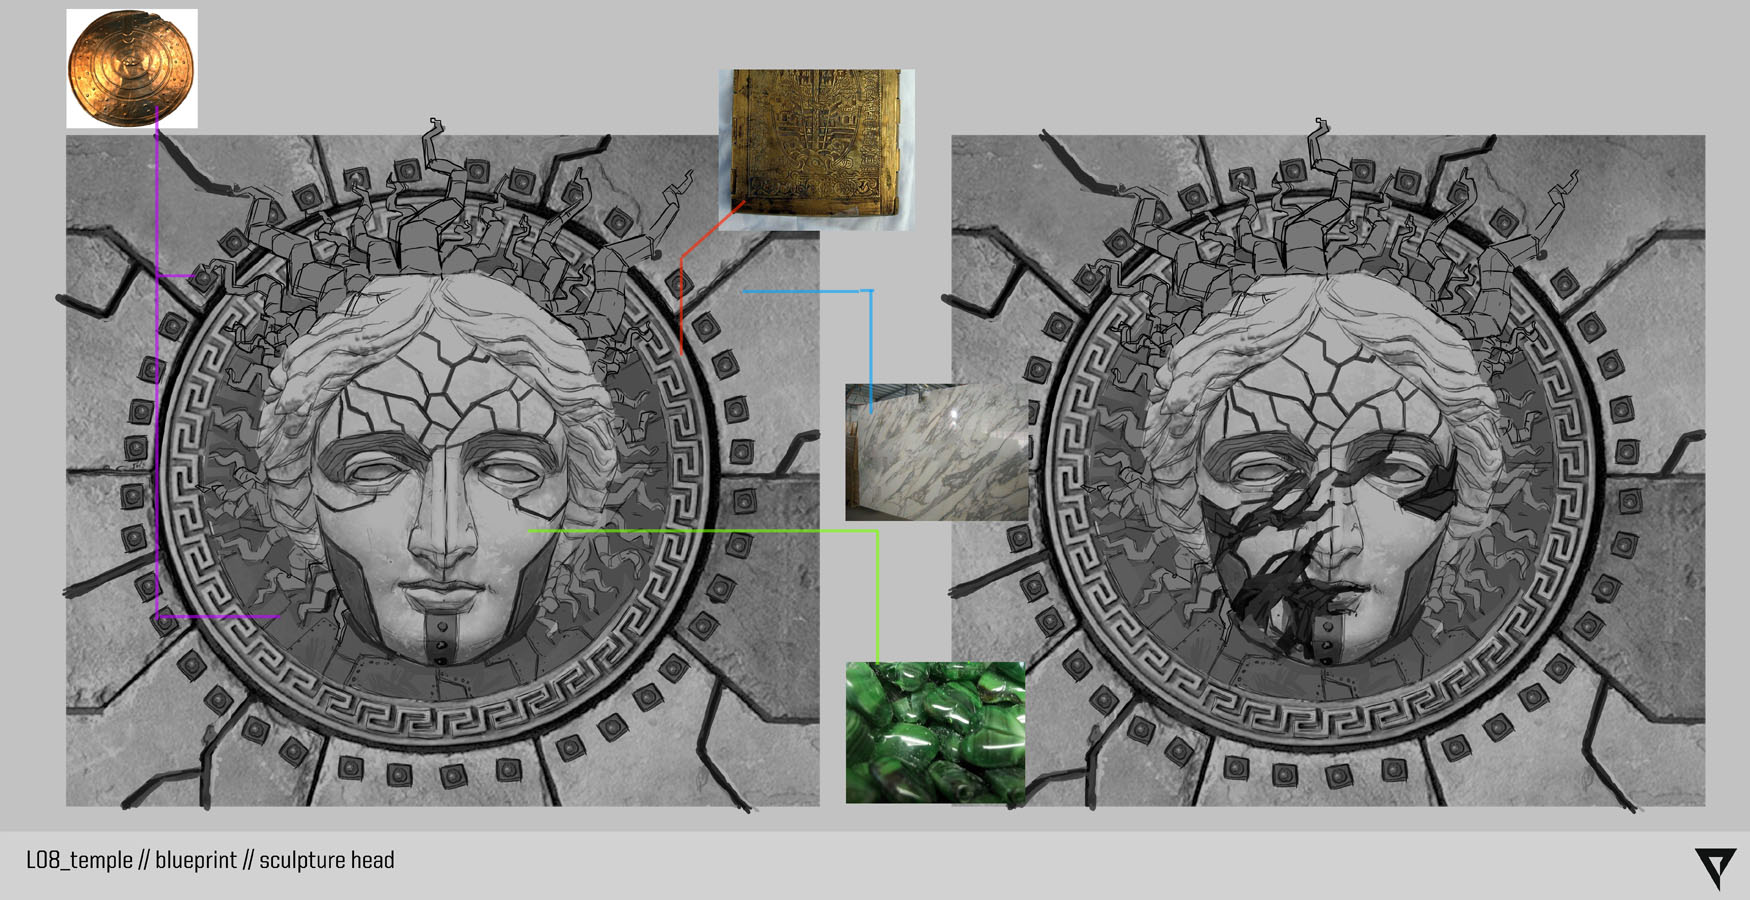 L08_temple_blueprint_sculpture head.jpg